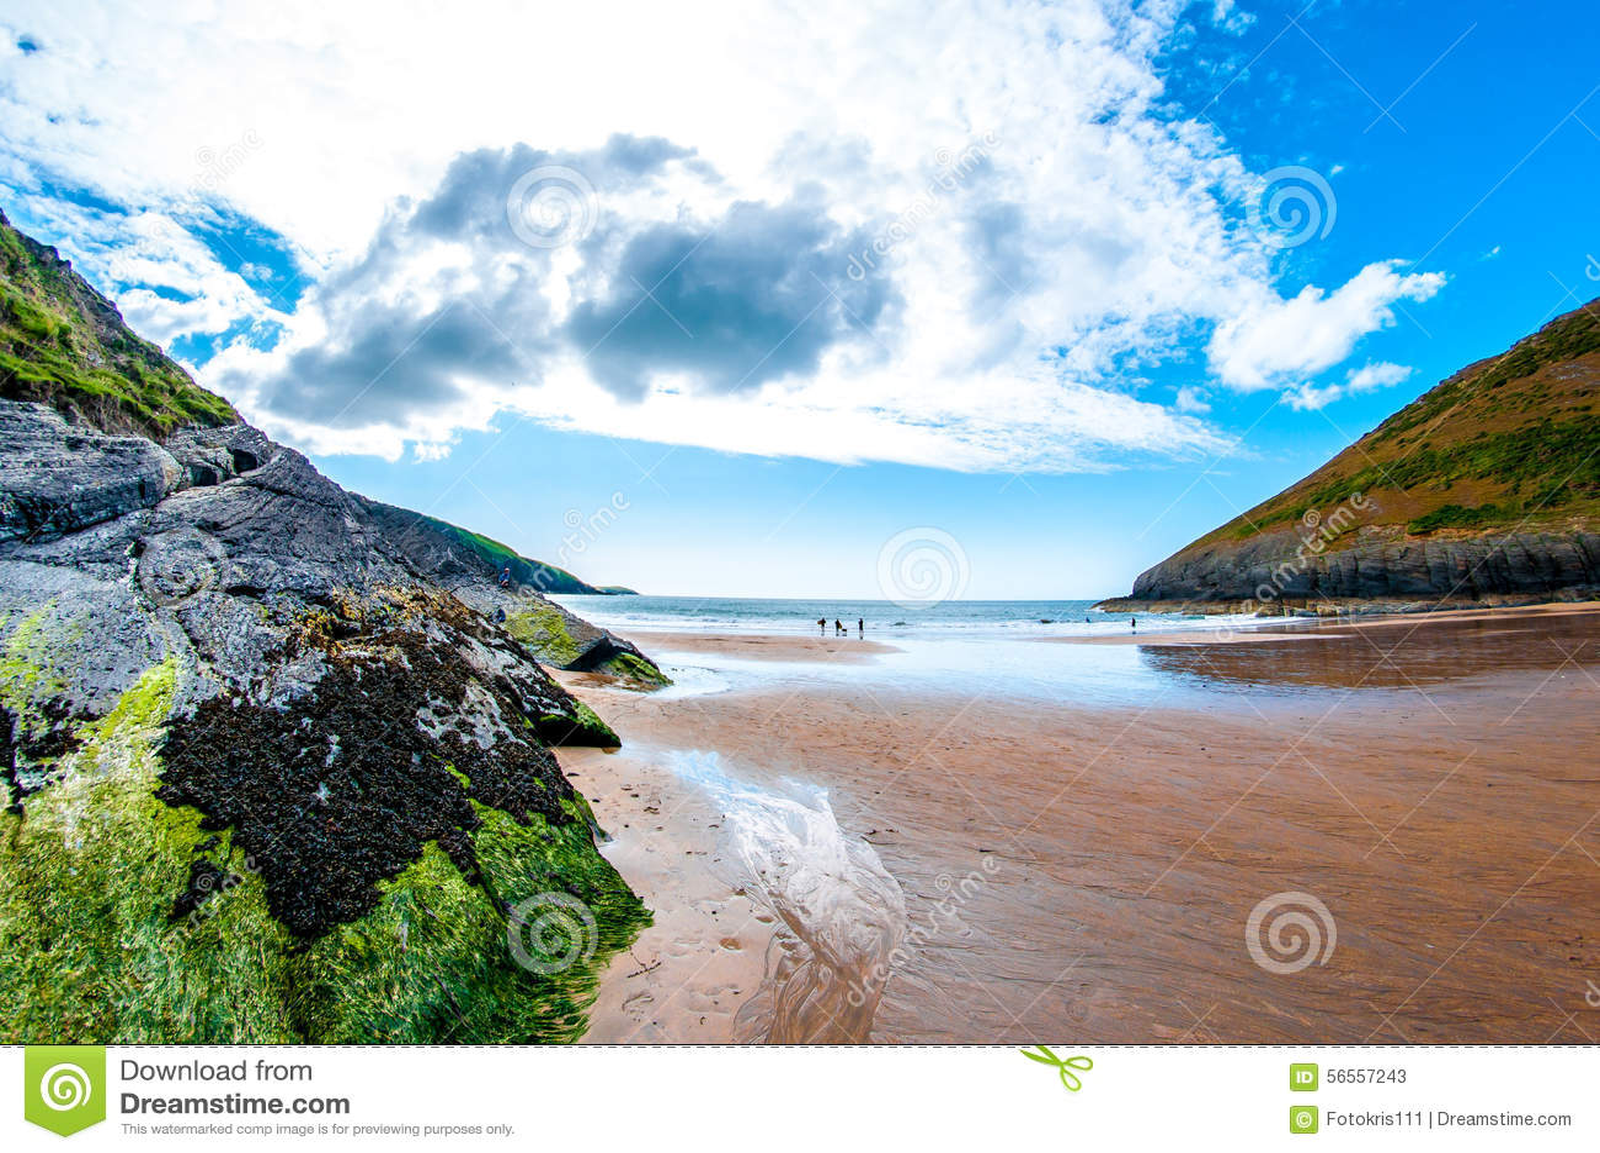 Download Θάλασσα ουρανού και σύννεφα και απότομοι βράχοι Στοκ Εικόνα - εικόνα από πανόραμα, ουρανός: 56557243